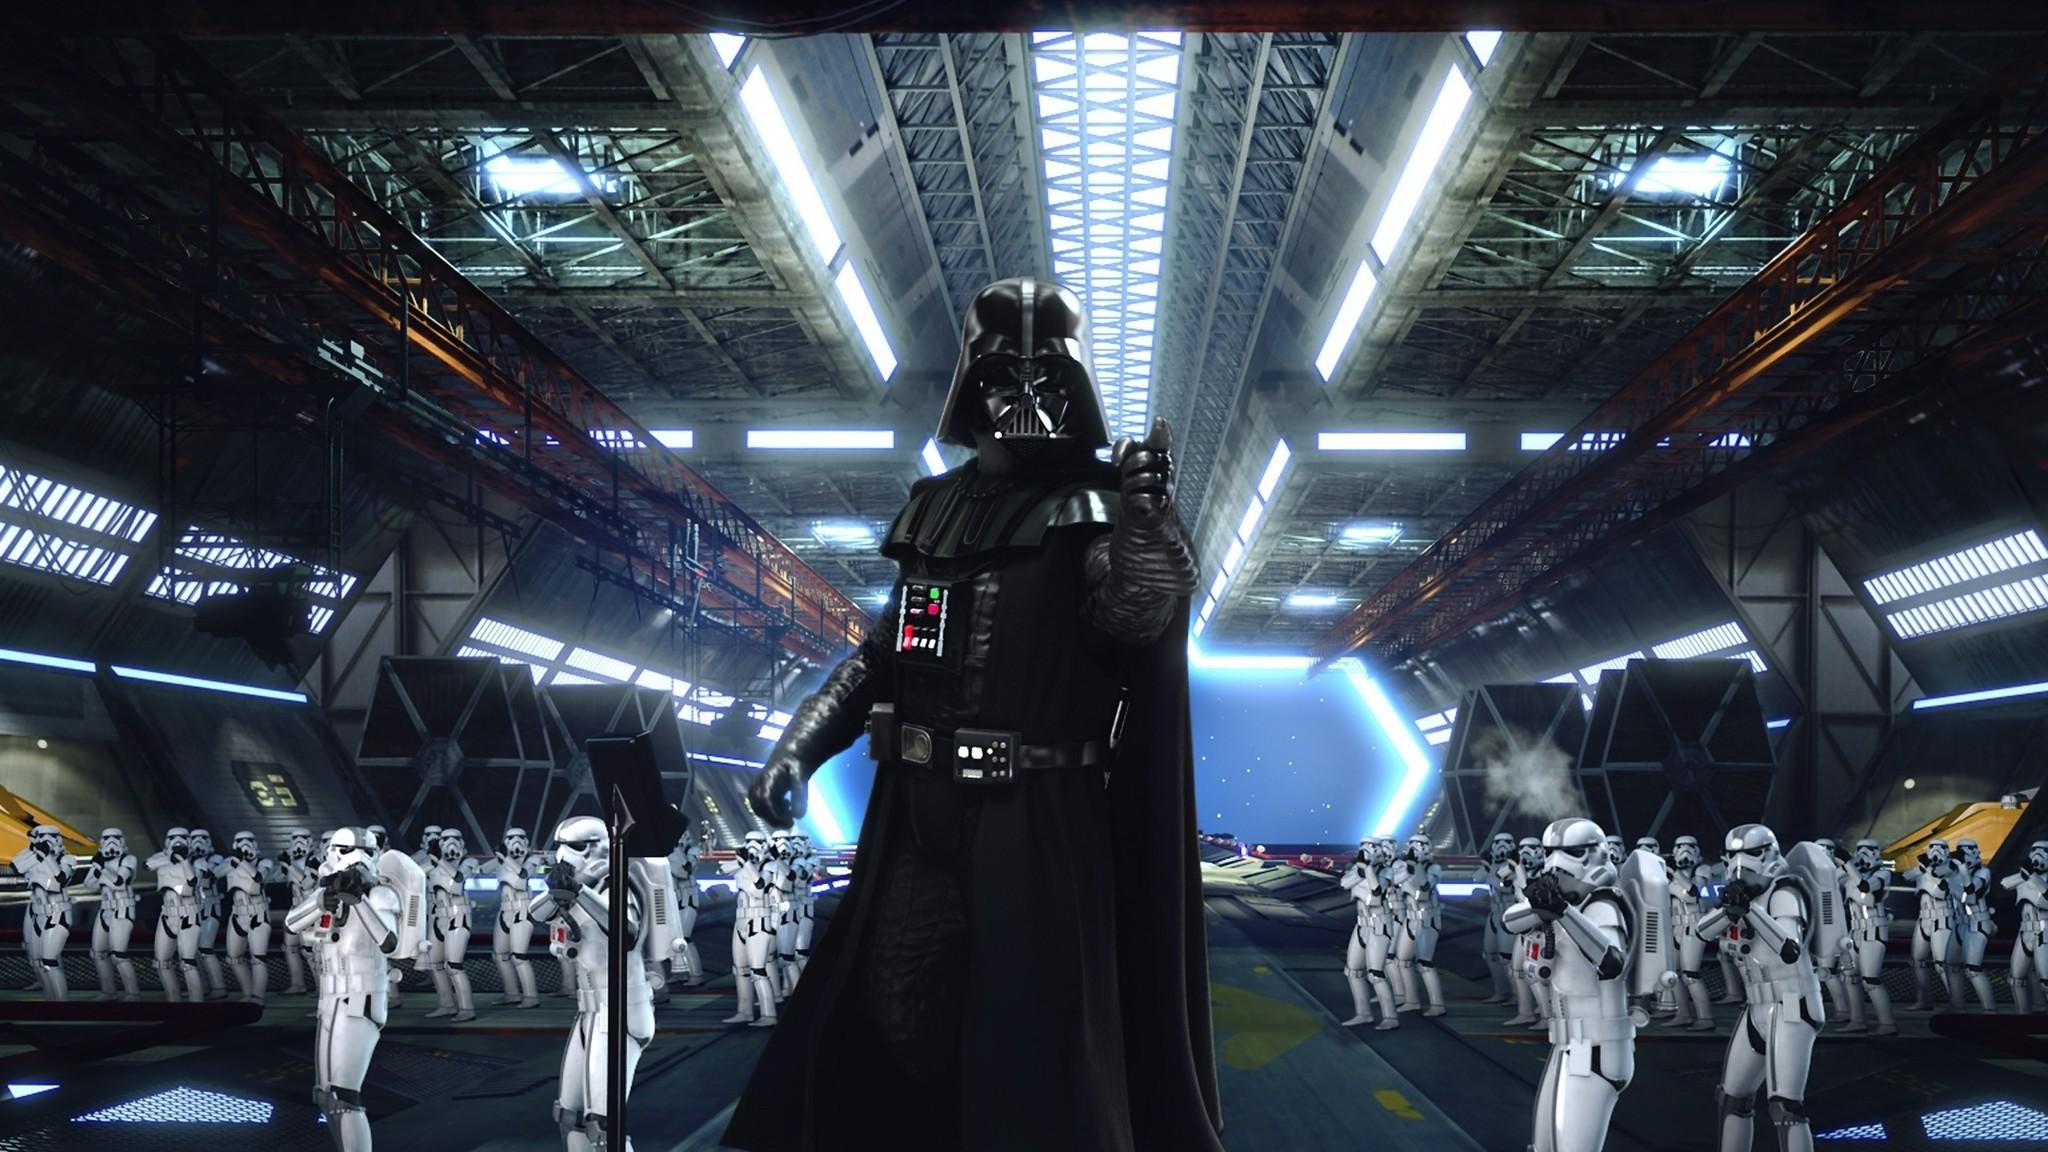 Description: Download Star wars movies stormtroopers darth vader tie  fighters wallpaper/desktop background in HD & Widescreen  resolution.